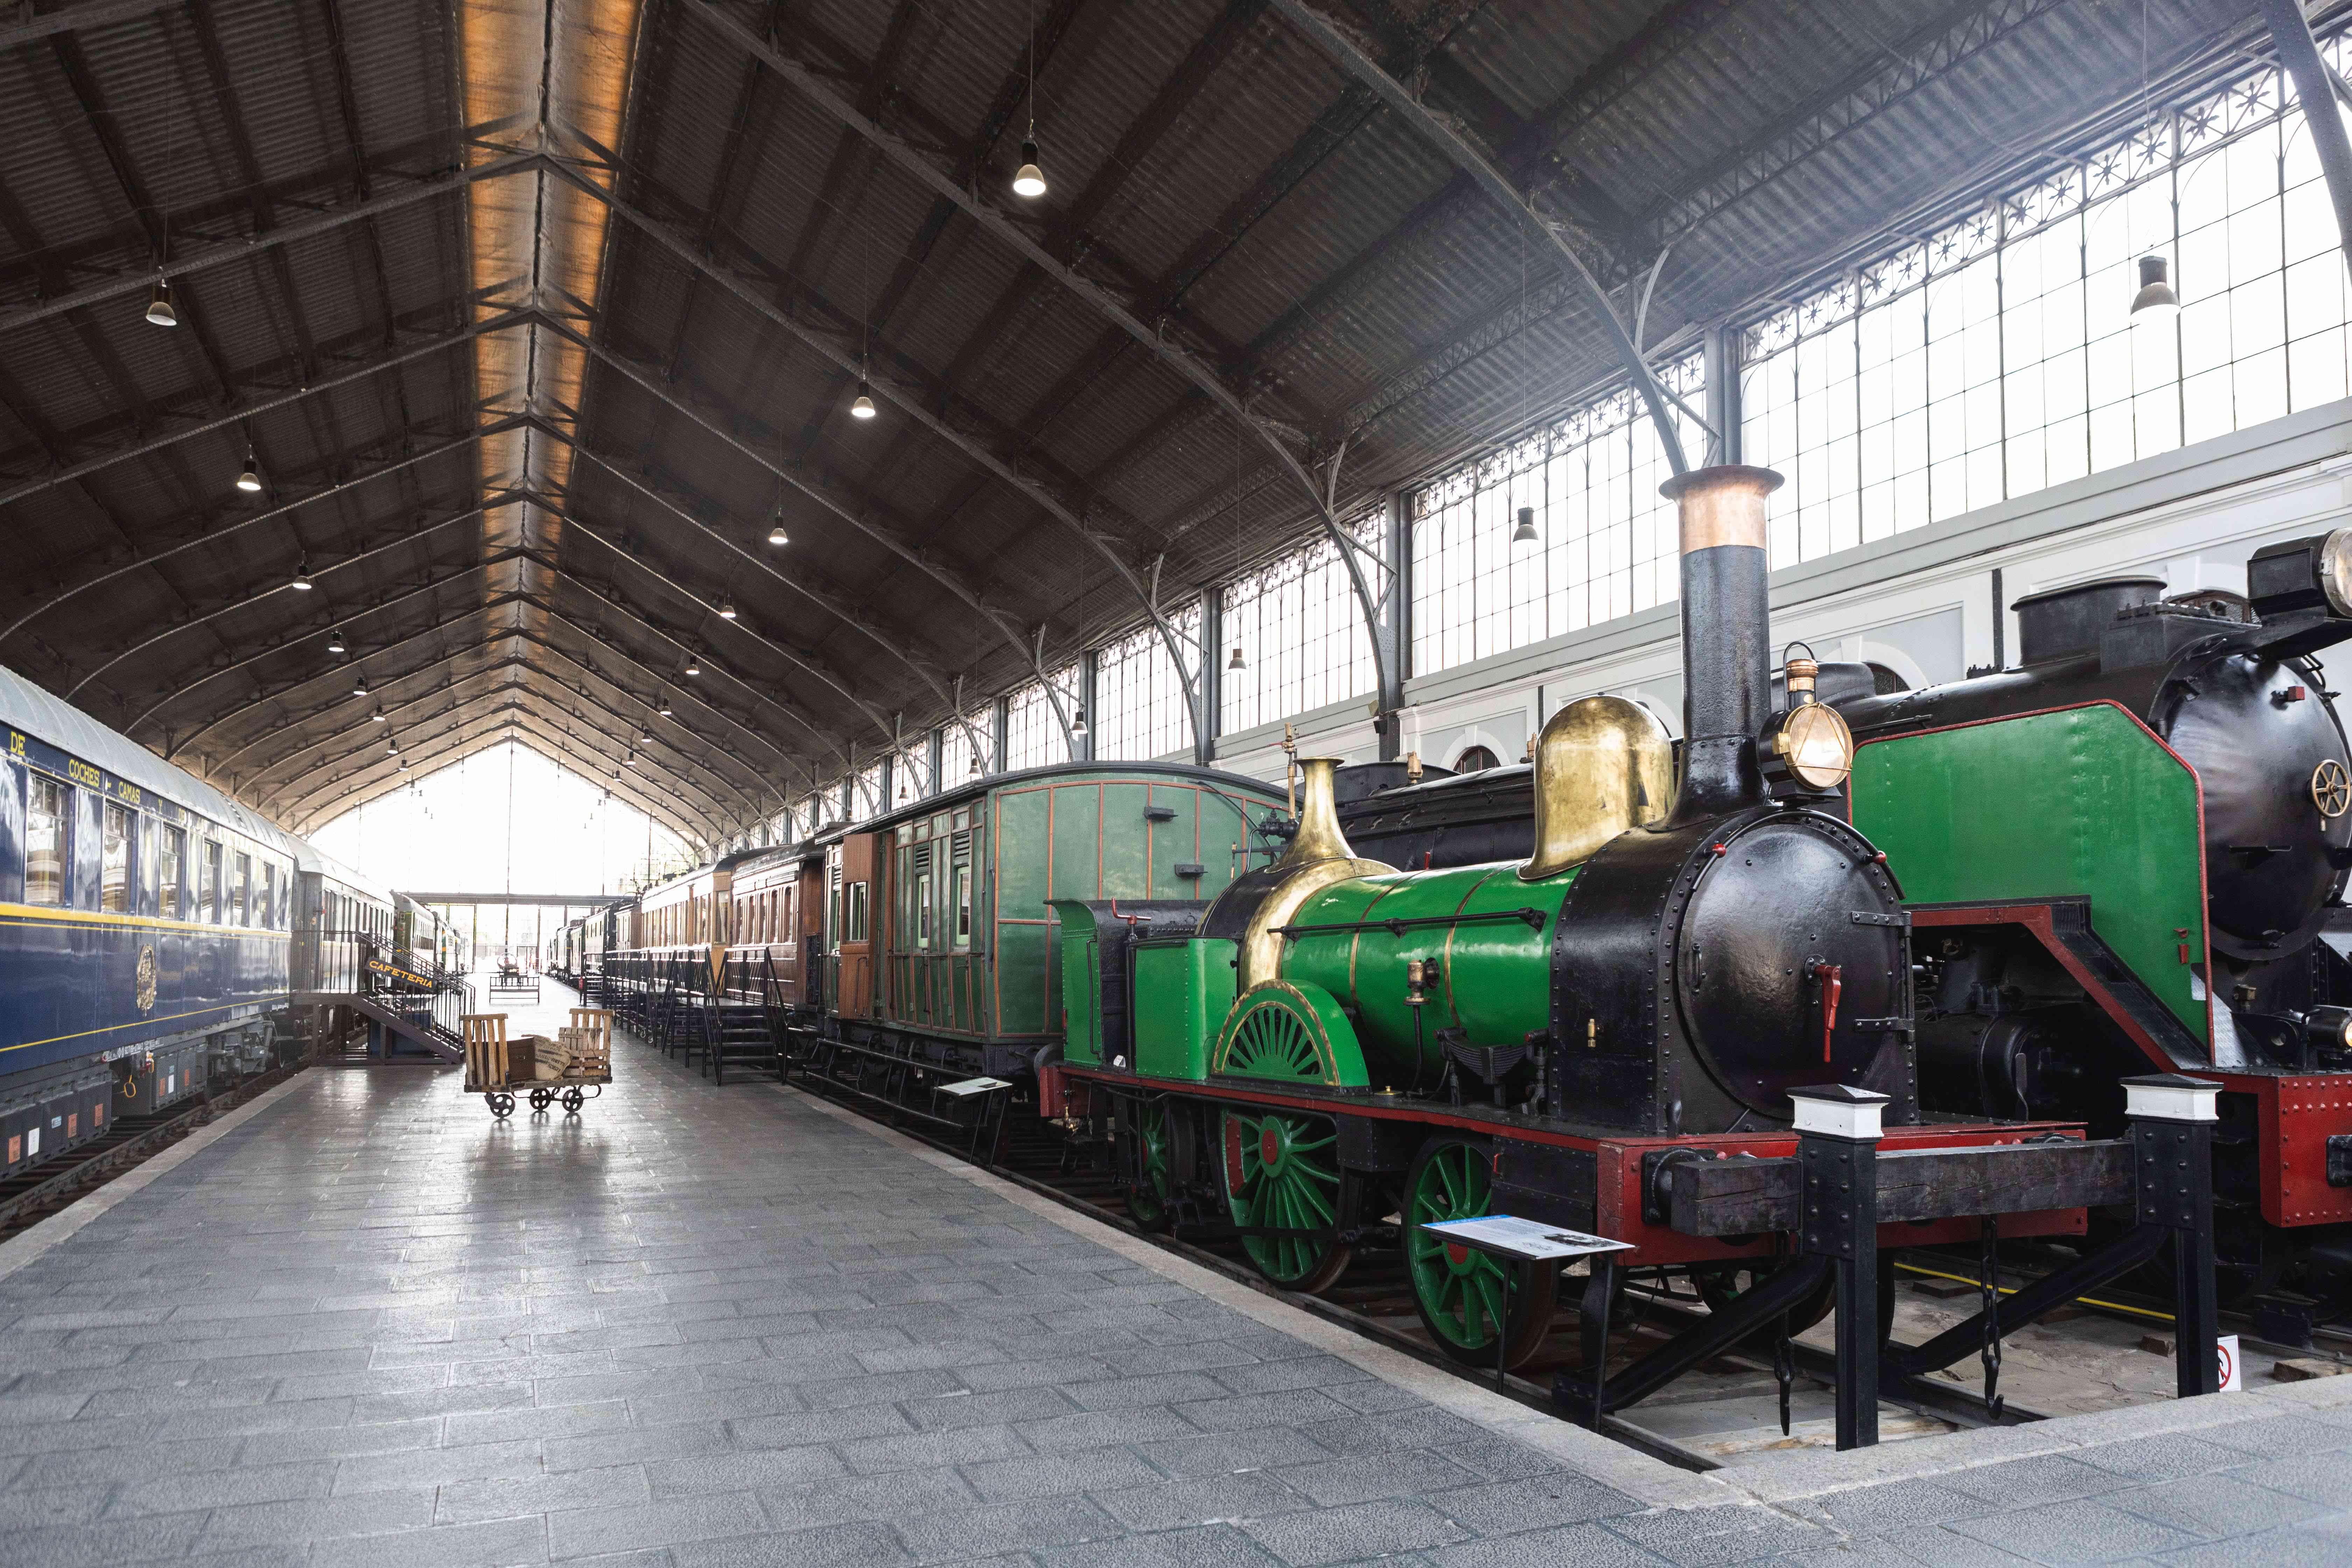 Museo del Ferrocarril in Madrid